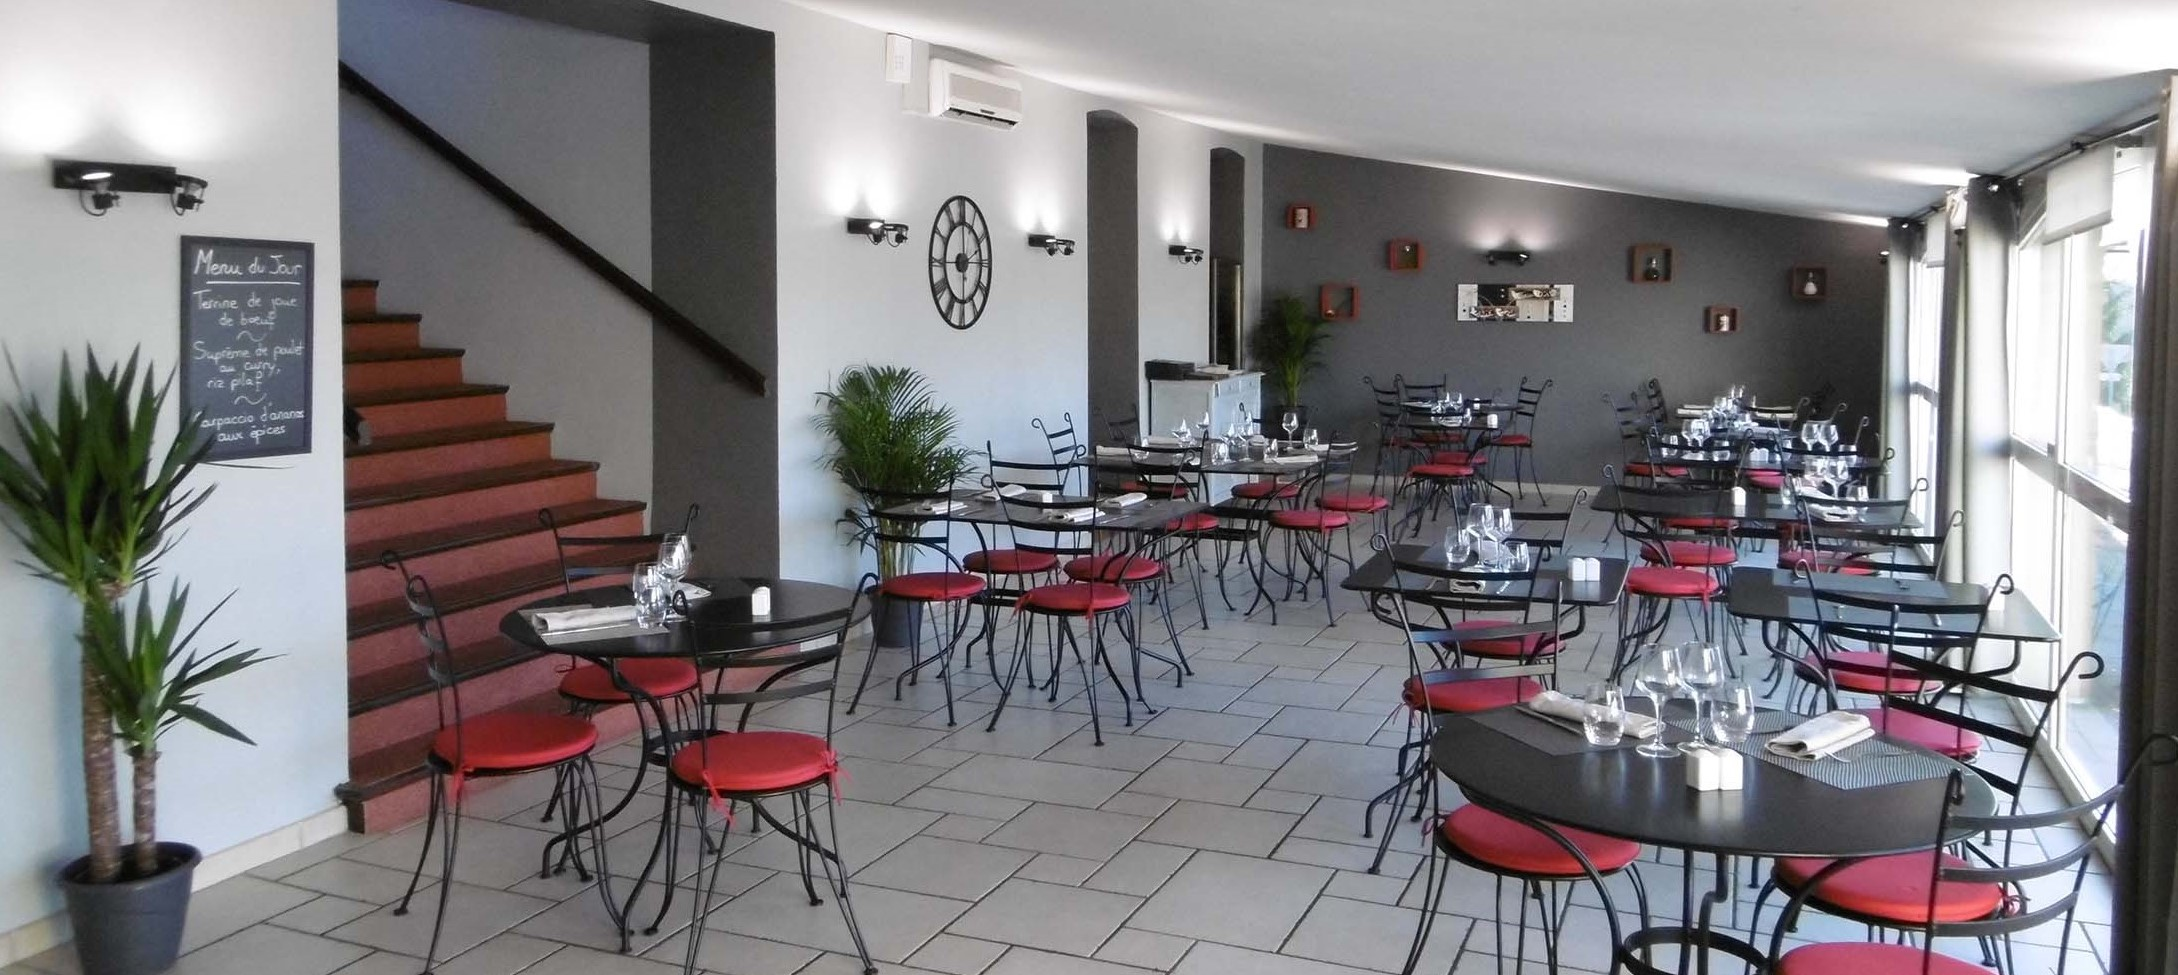 Restaurant Le Macis, à Sainte Hermine